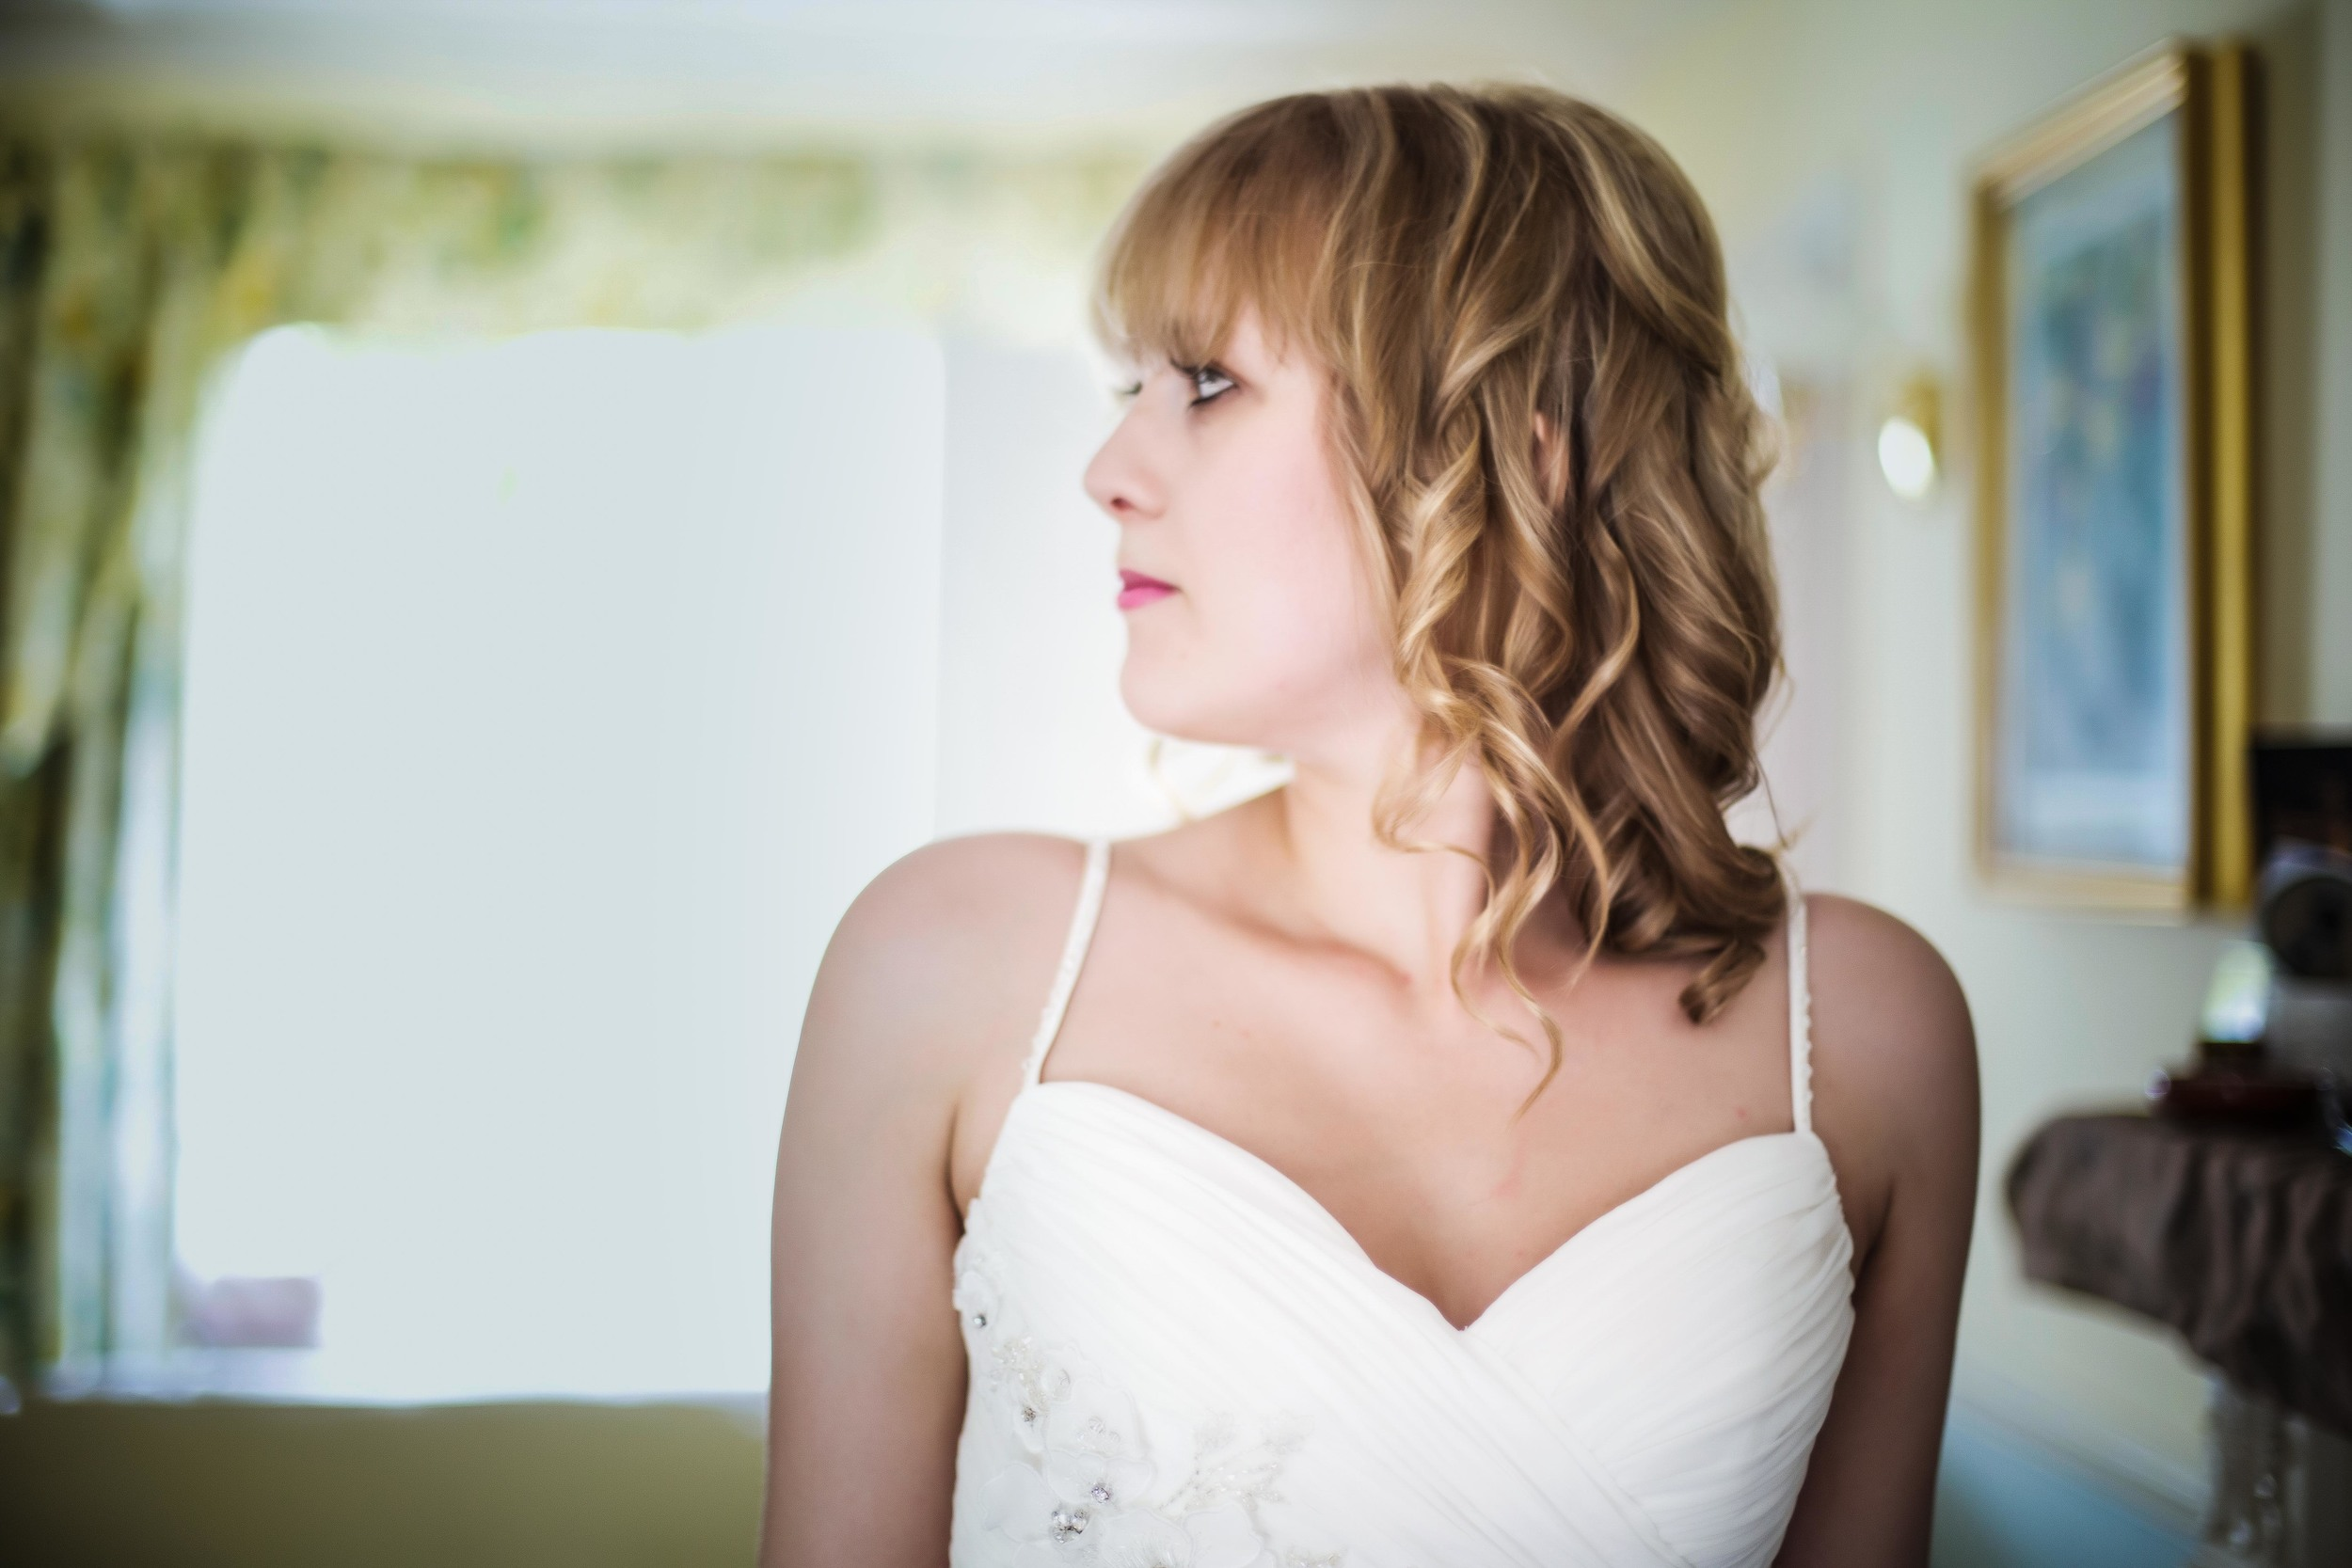 cochester-bridal-prep-london-uk-destination-wedding-photography-Adam-Rowley